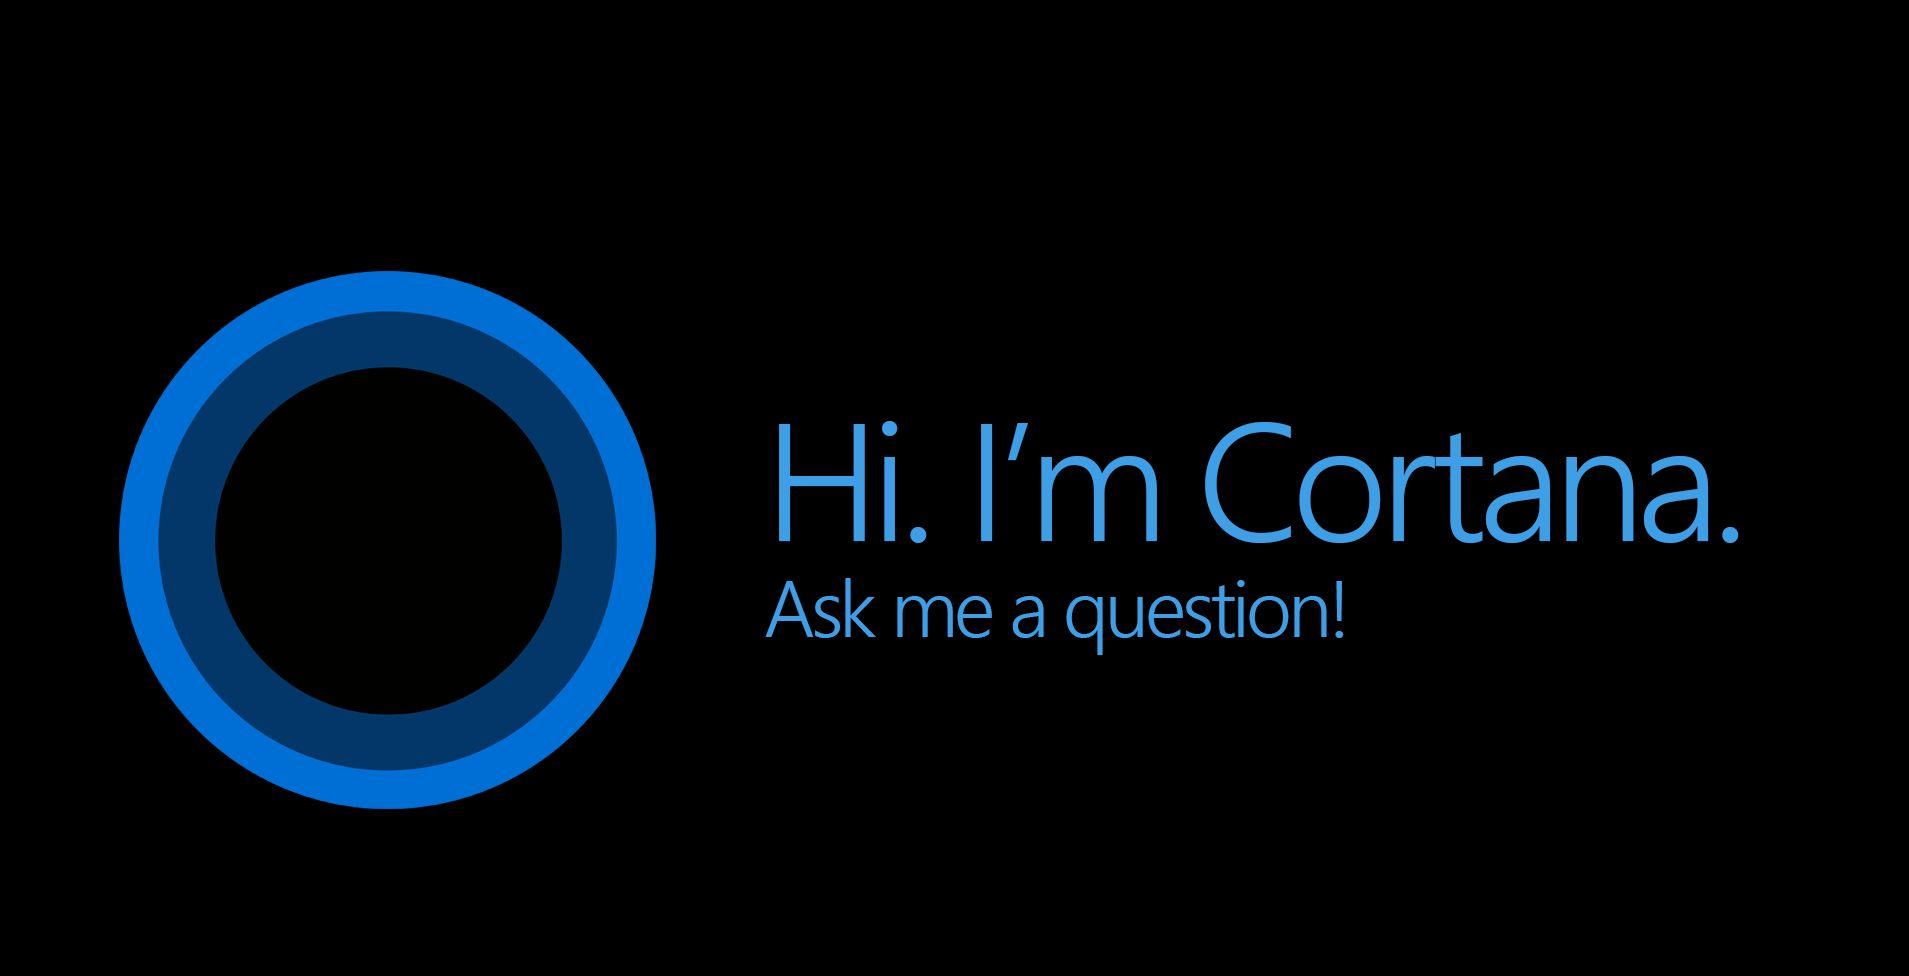 Kagan: Why Microsoft Cortana AI is still not well-known